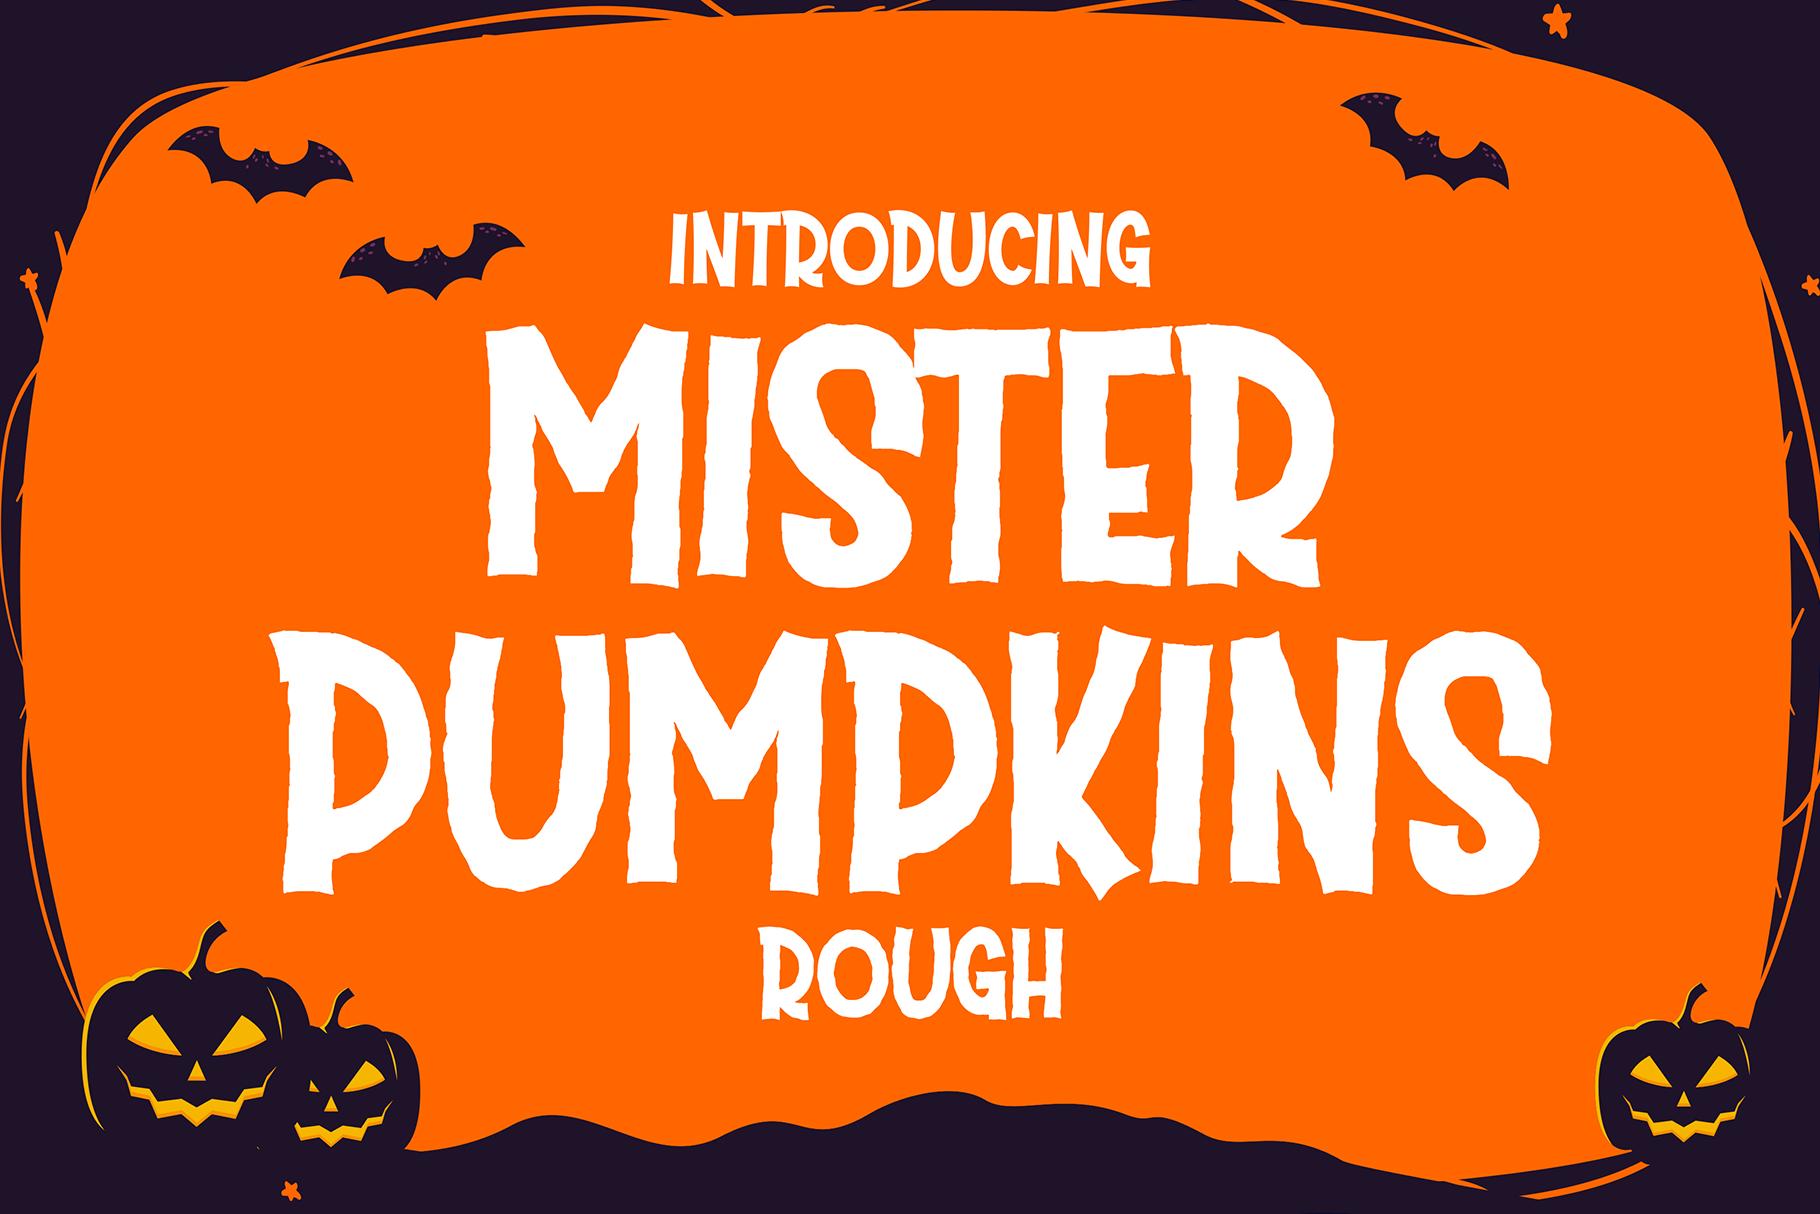 Mister Pumpkins Rough (Font) by fadhil figuree · Creative